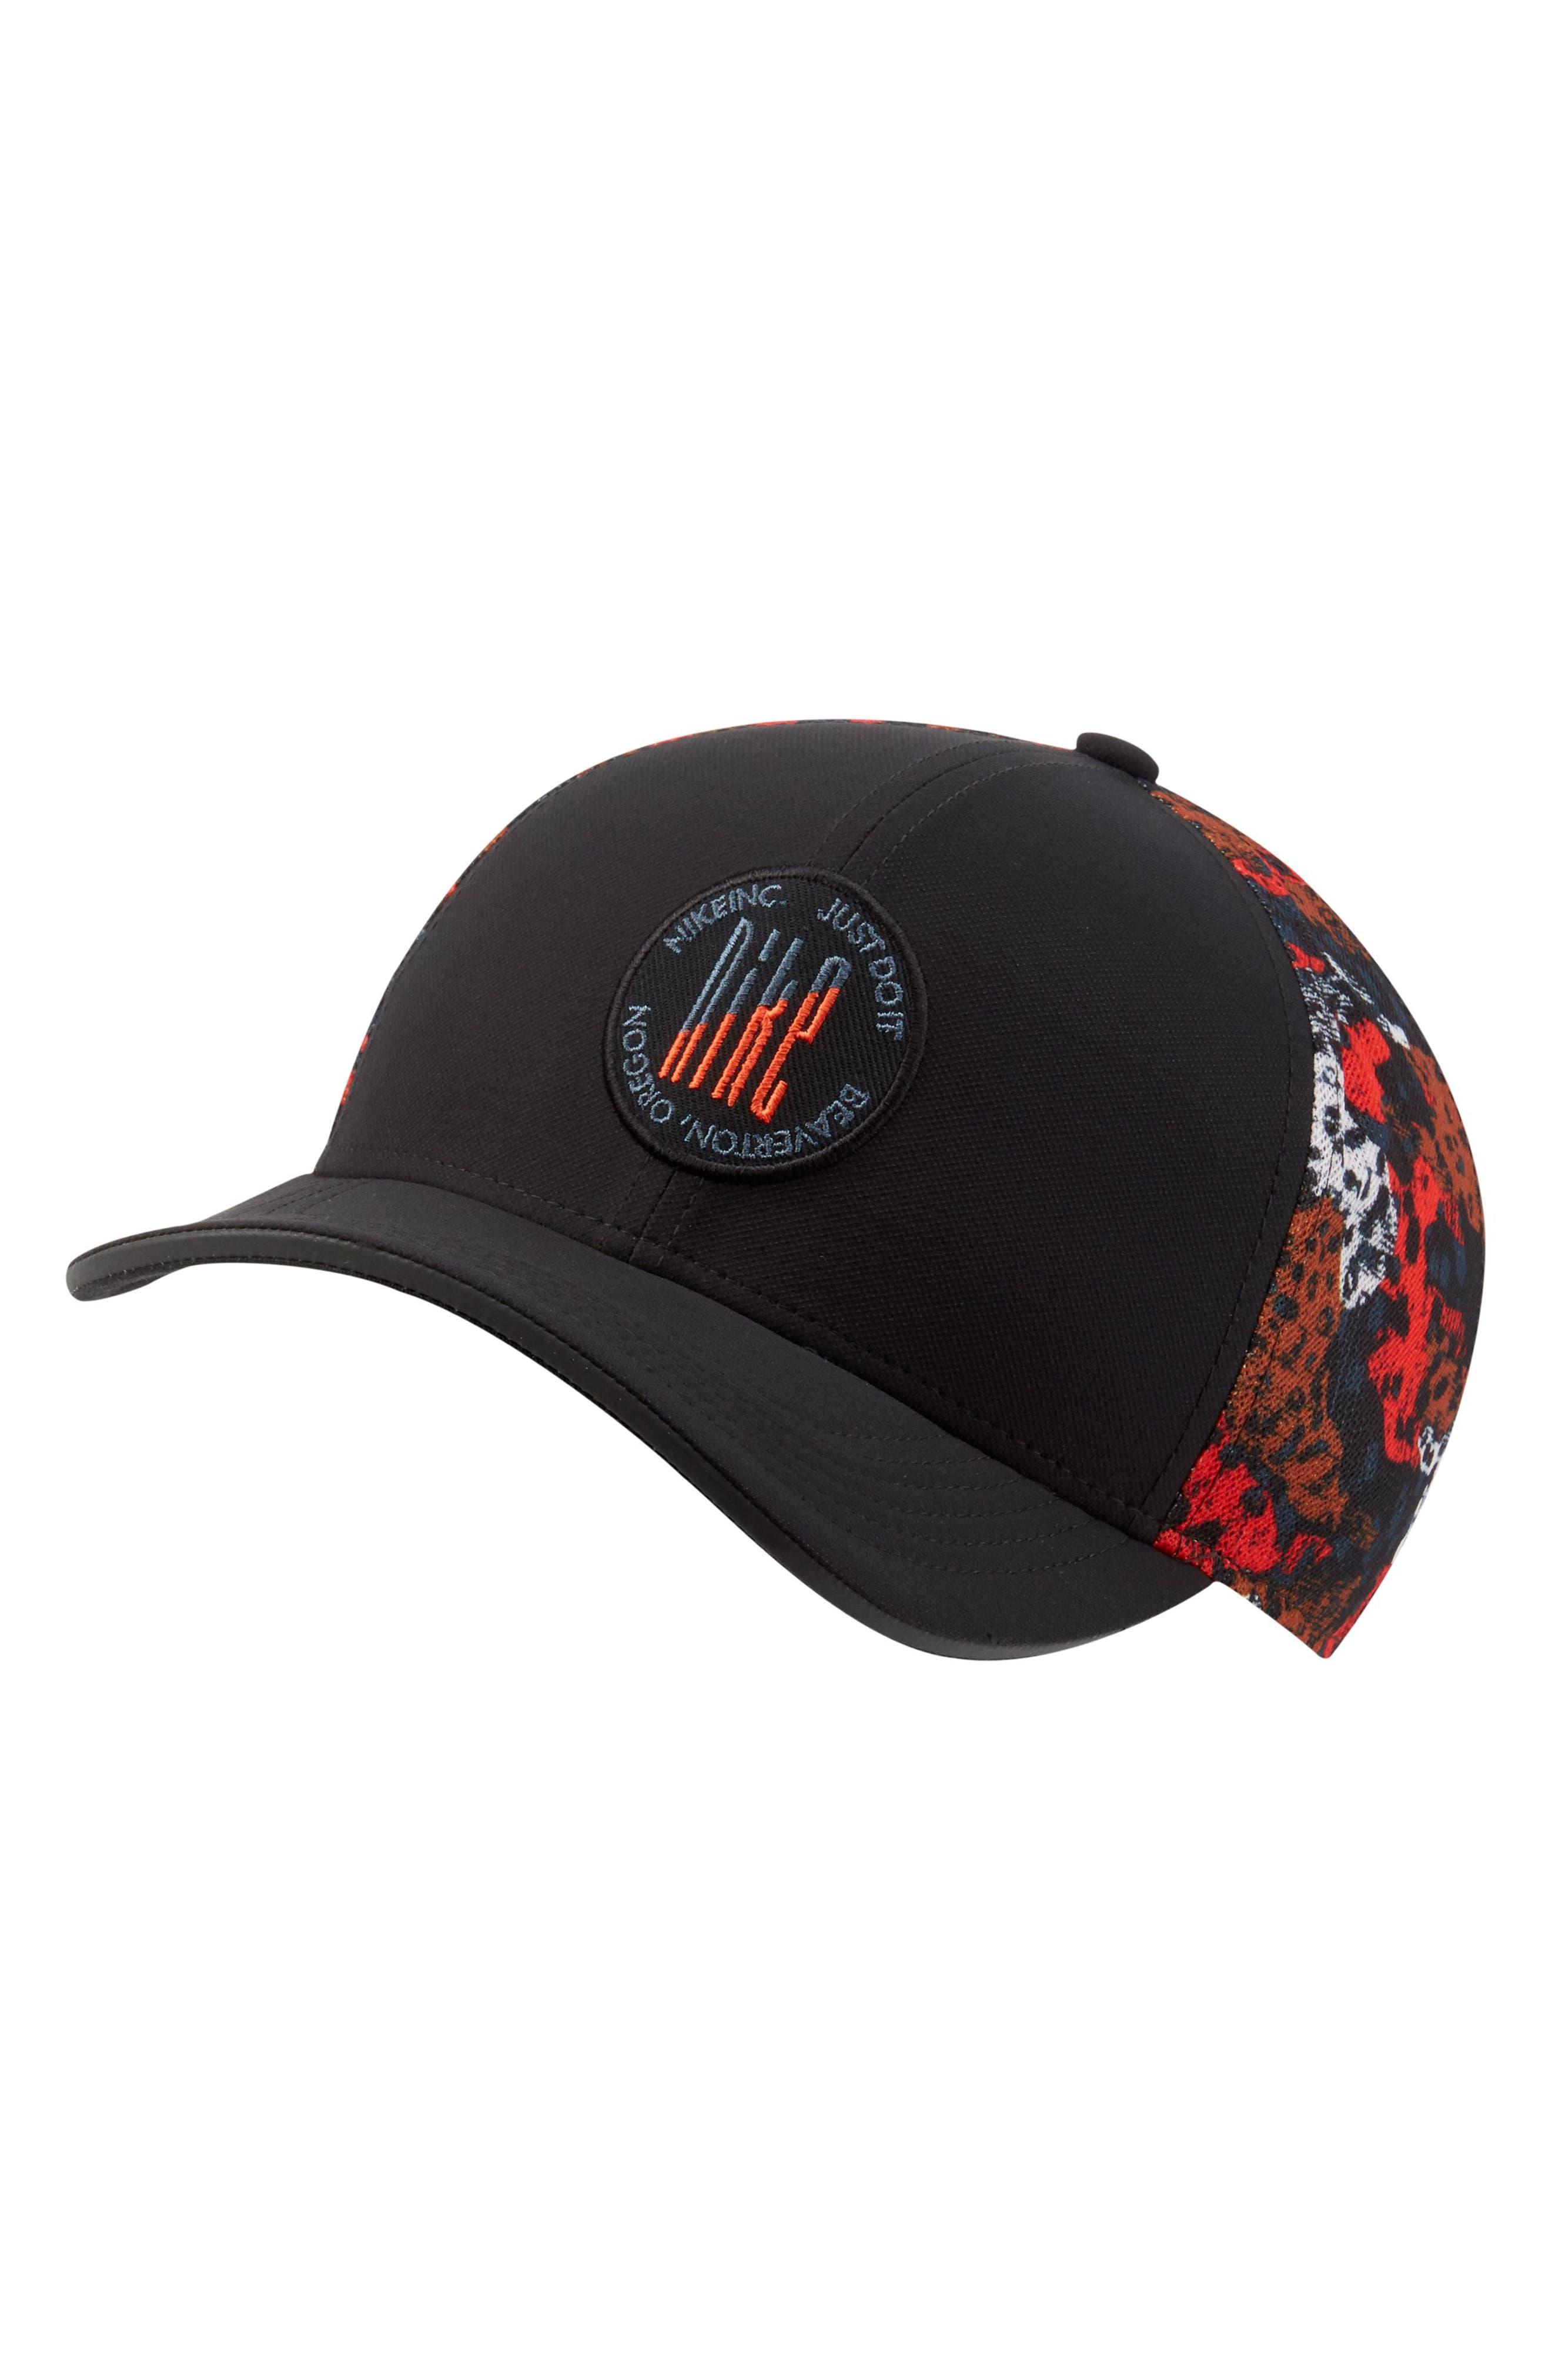 NIKE Dry Trucker Cap, Main, color, BLACK